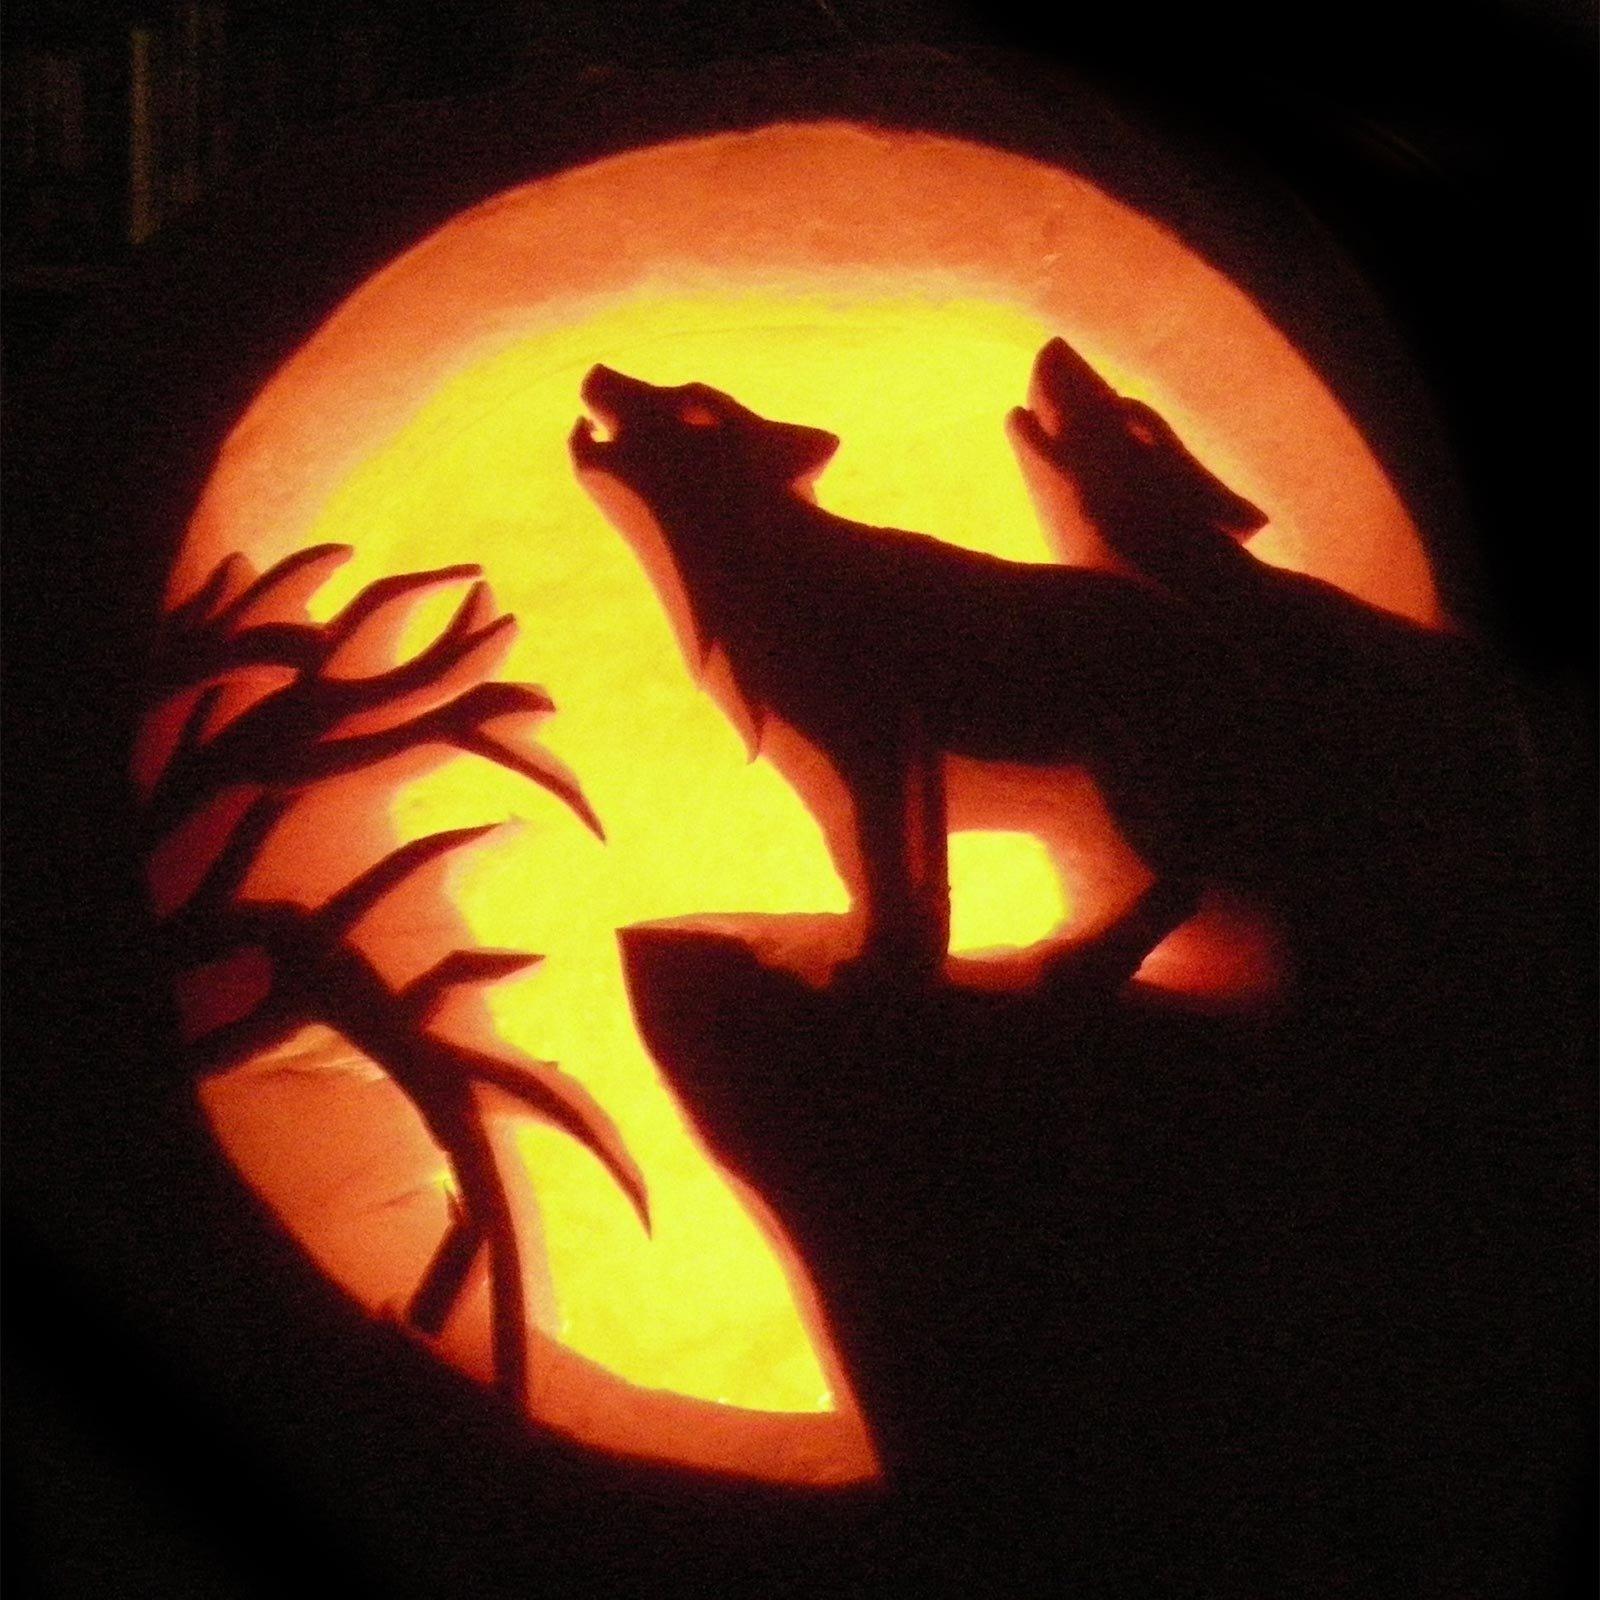 10 Wonderful Cool Ideas For Pumpkin Carving cool pumpkin cravings 28 best cool scary halloween pumpkin carving 4 2020